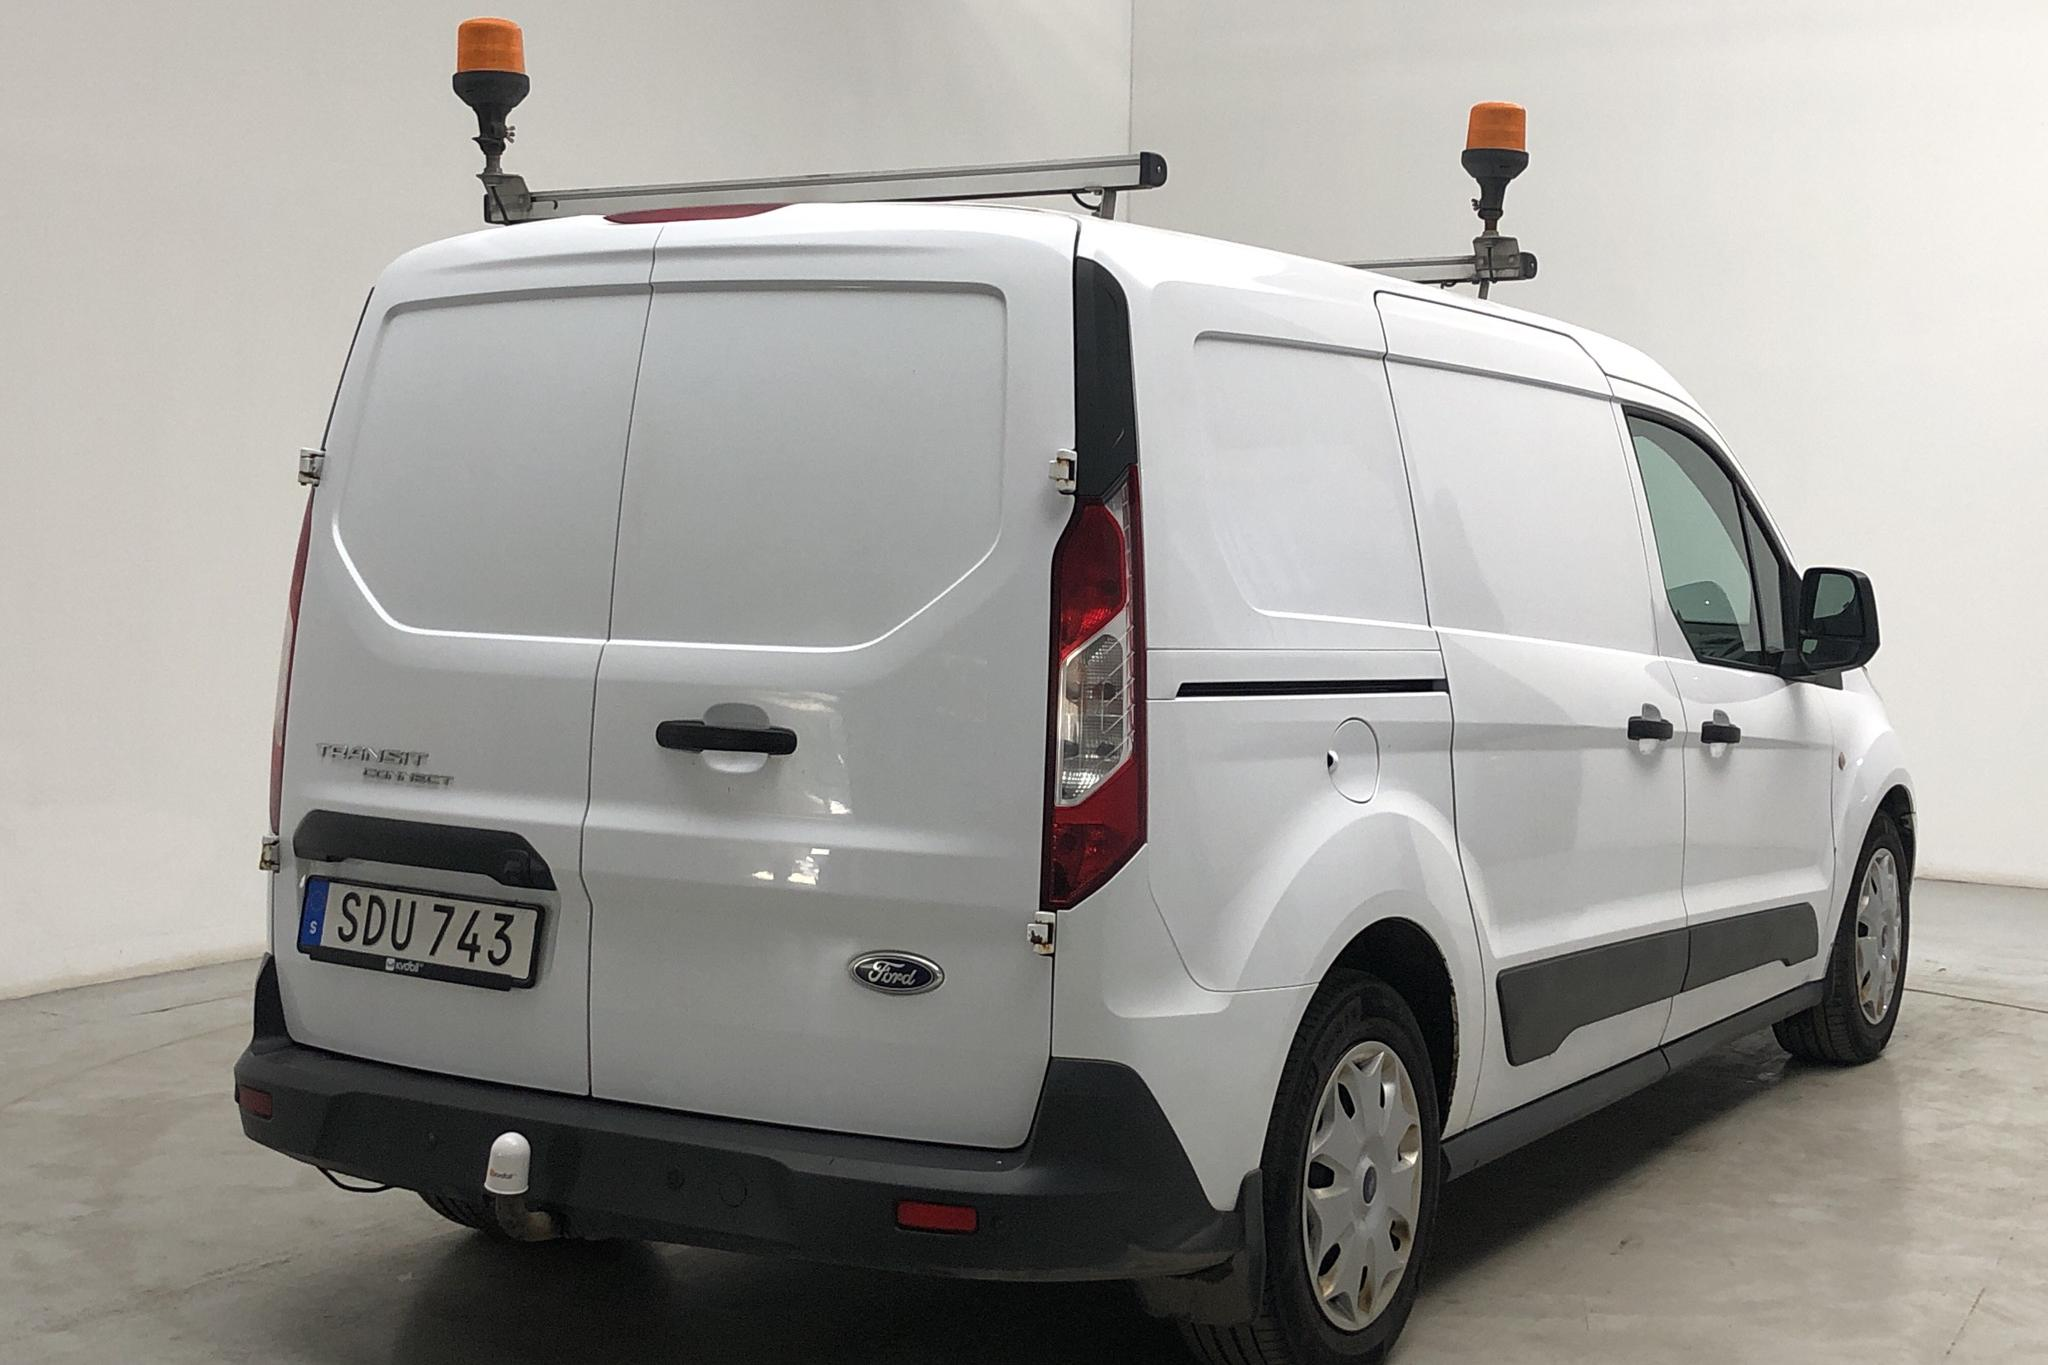 Ford Transit Connect 1.6 TDCi (95hk) - 296 680 km - Manual - white - 2015